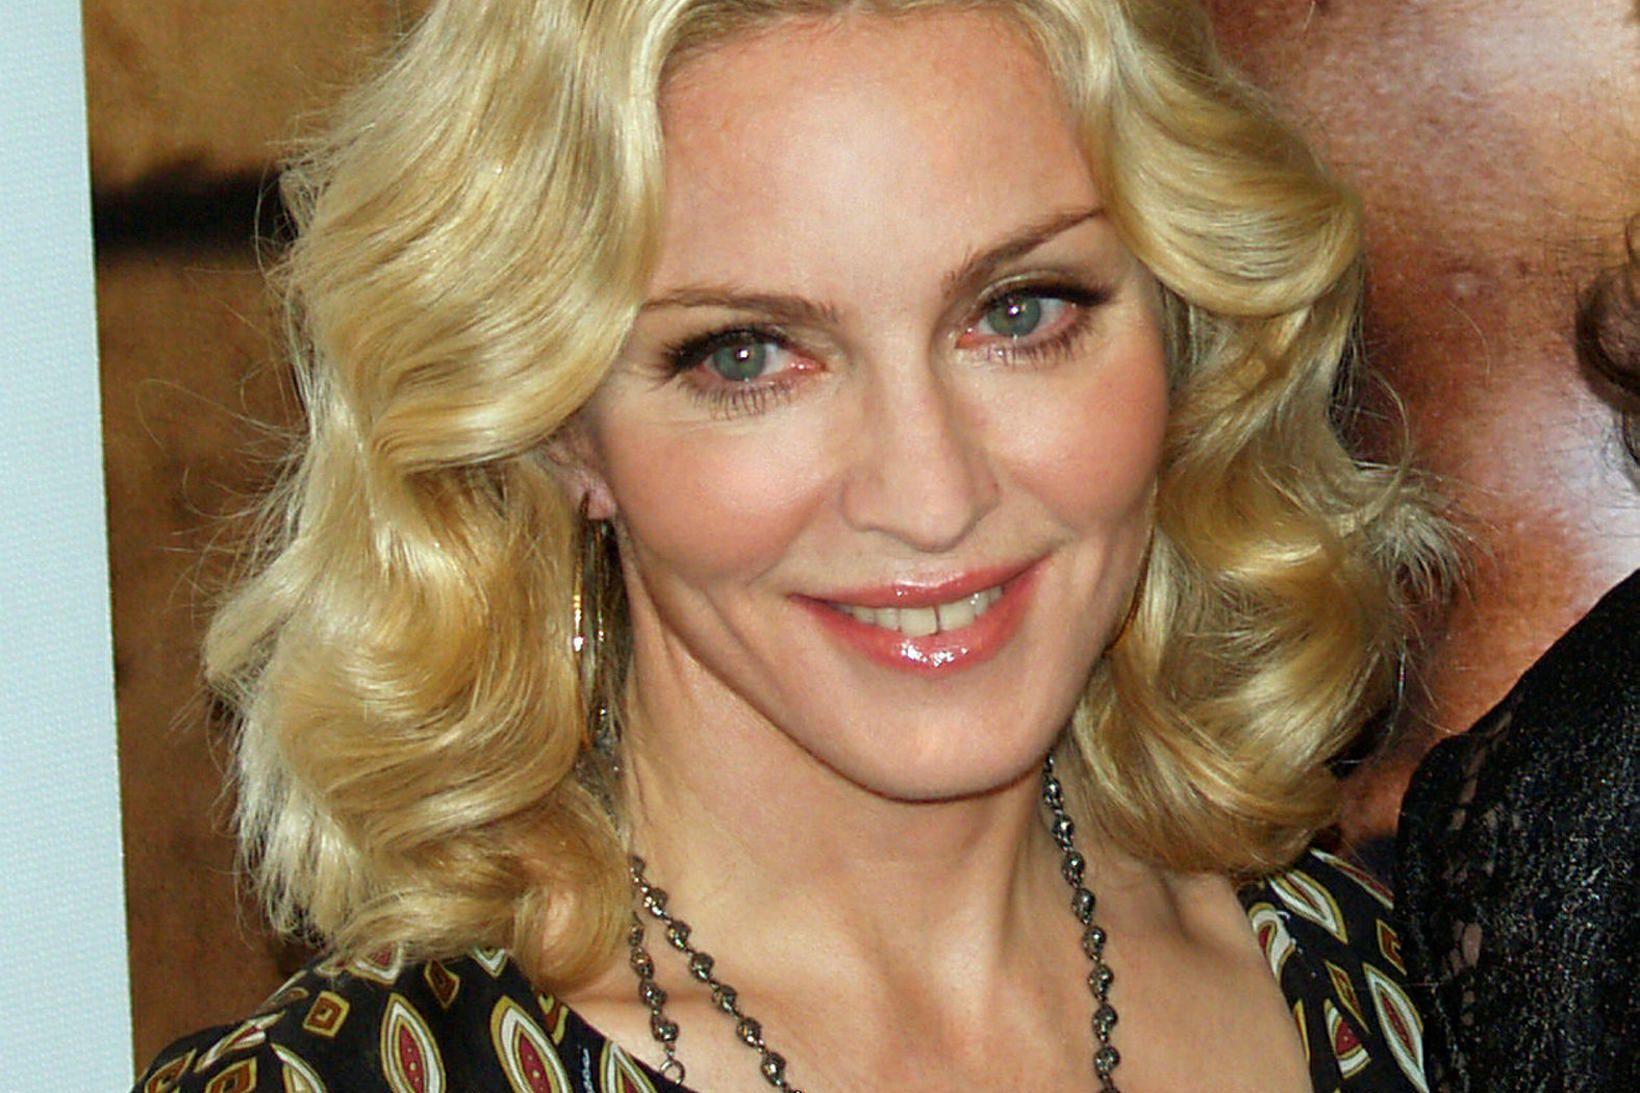 Afturendi Madonnu vekur athygli.